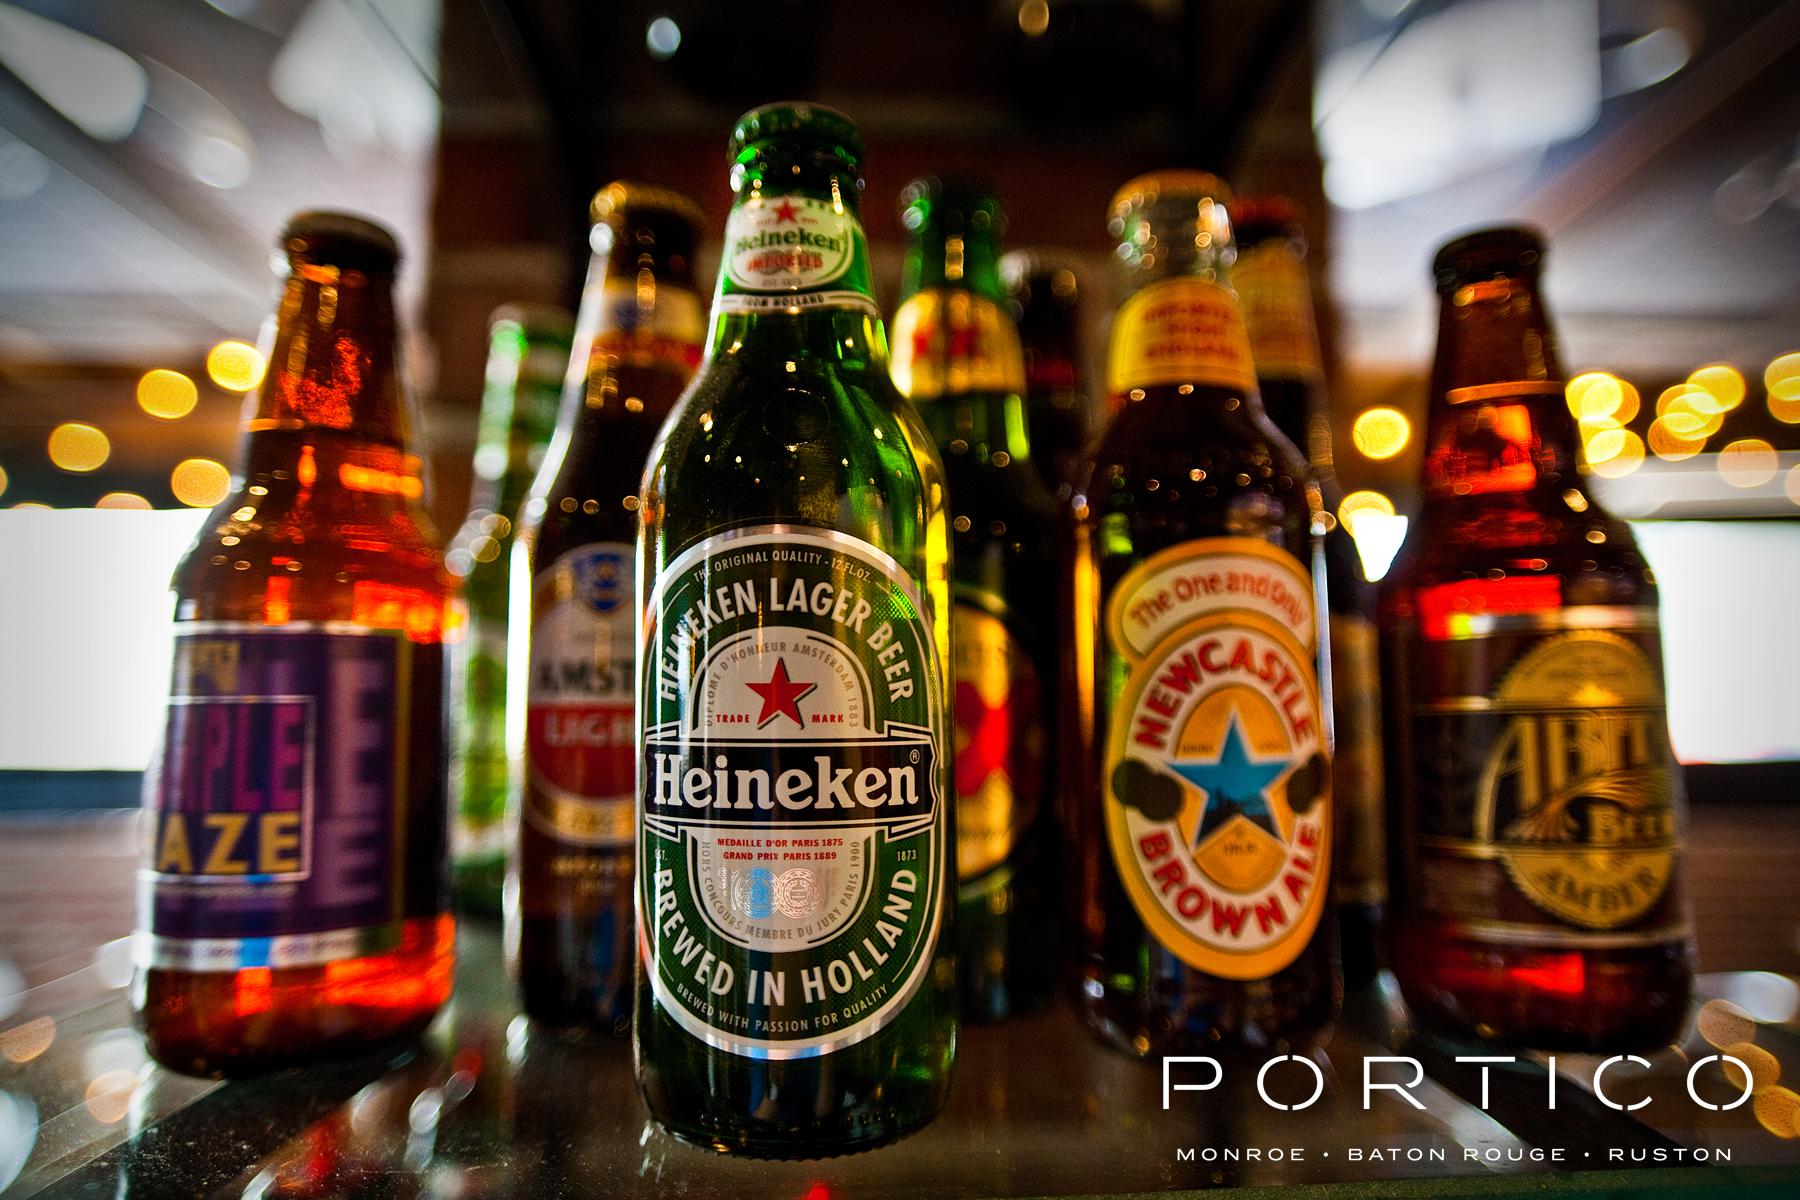 За сите љубители на пивото: Топ 10 најпознати пива низ светот